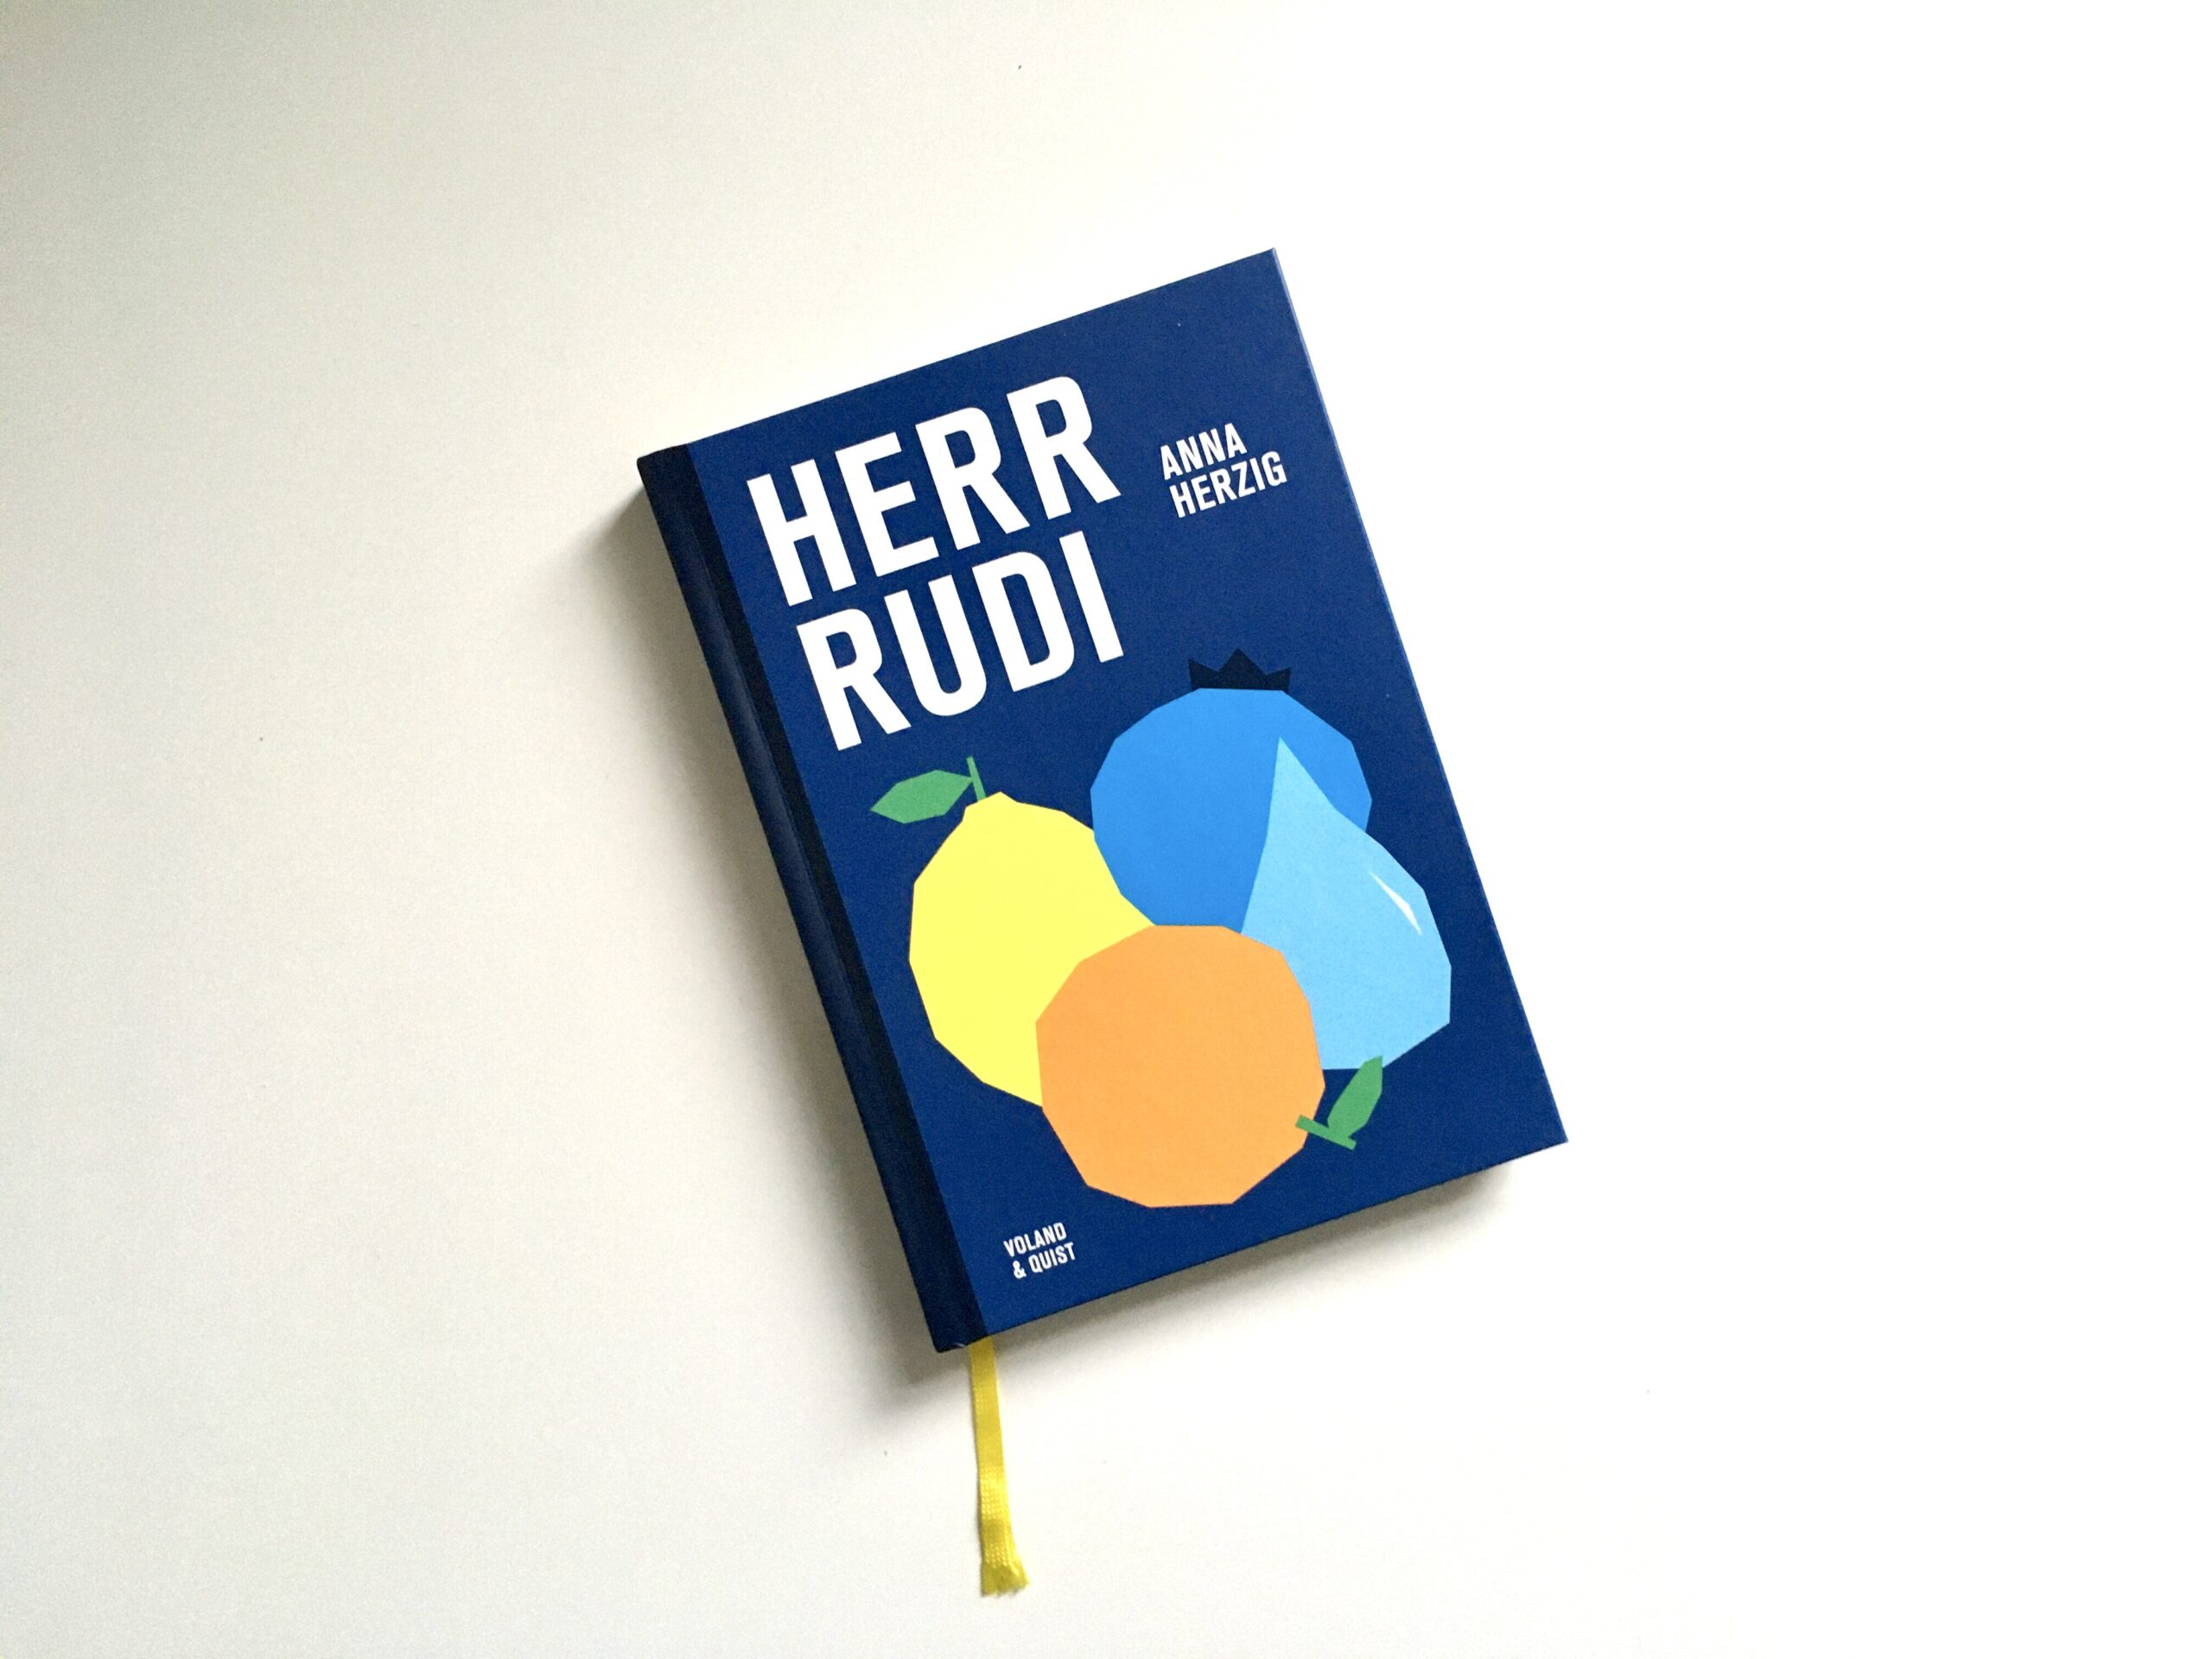 Anna Herzig: Herr Rudi